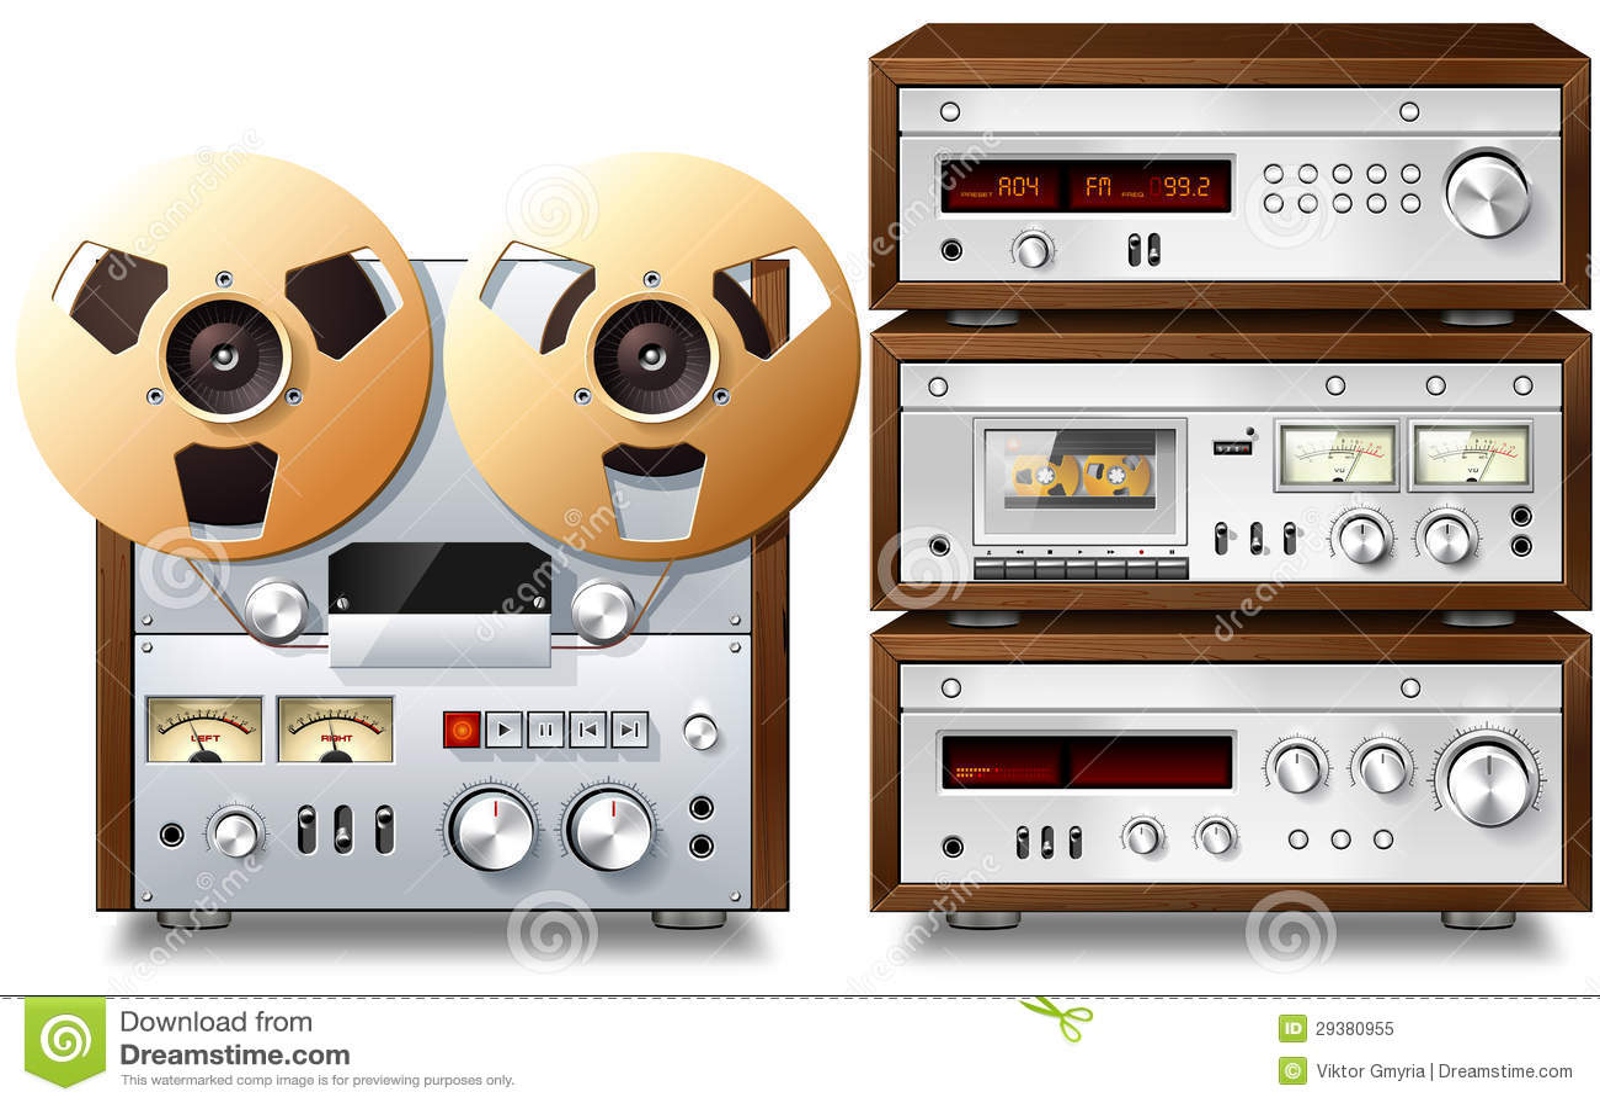 free vintage stereo appraisal